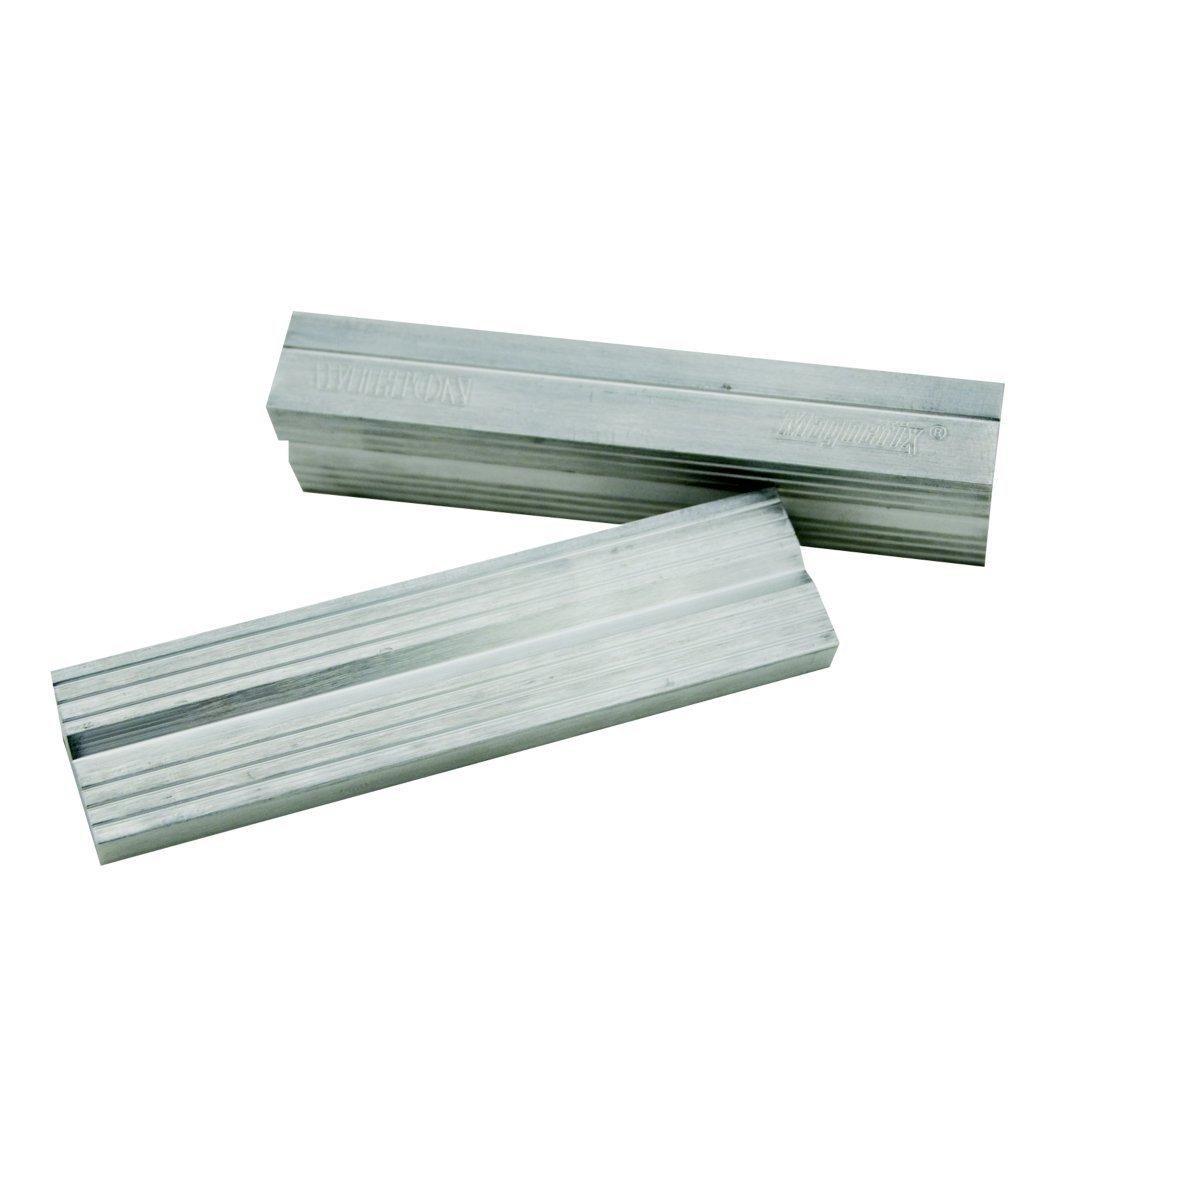 Wilton 14831 A-6, Aluminum Jaw Cap, 6-Inch Jaw Width, 2 -Pack